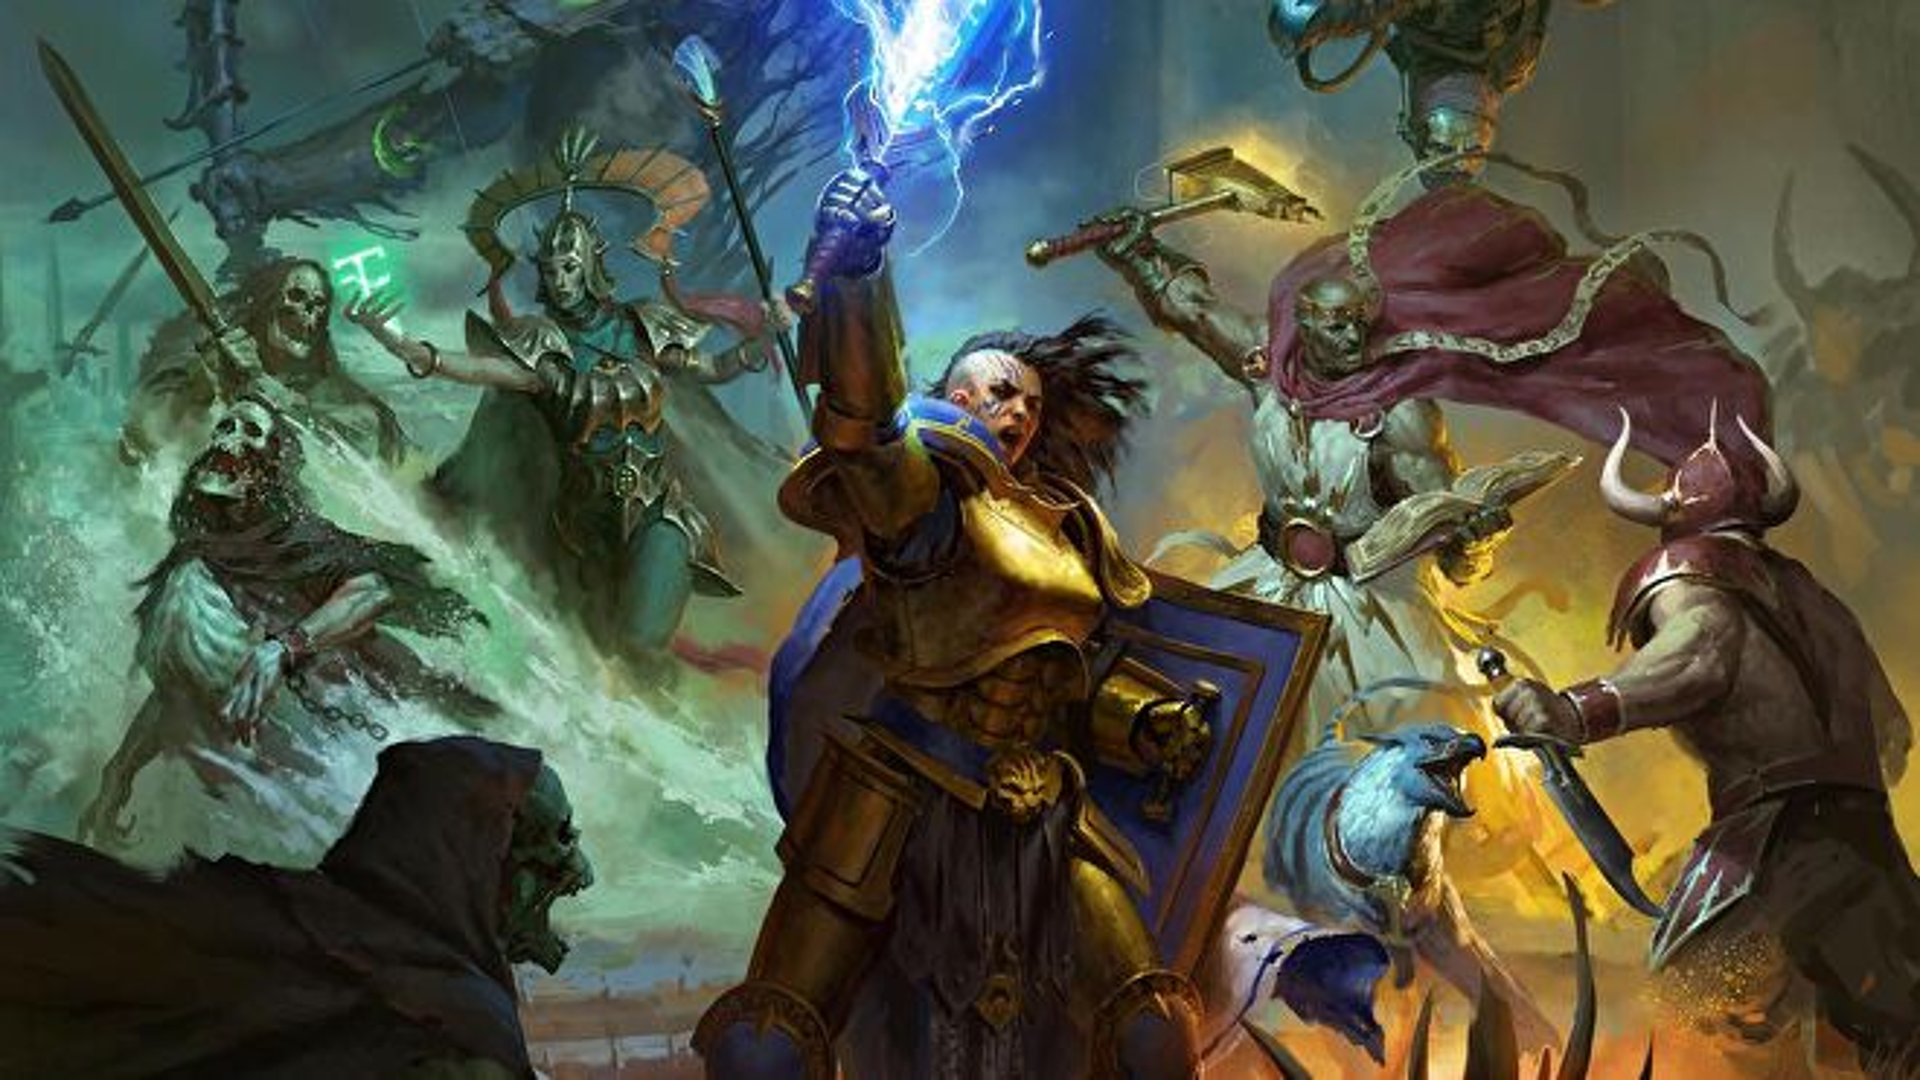 warhammer-age-of-sigmar-soulbound-rpg-cover-art.jpg